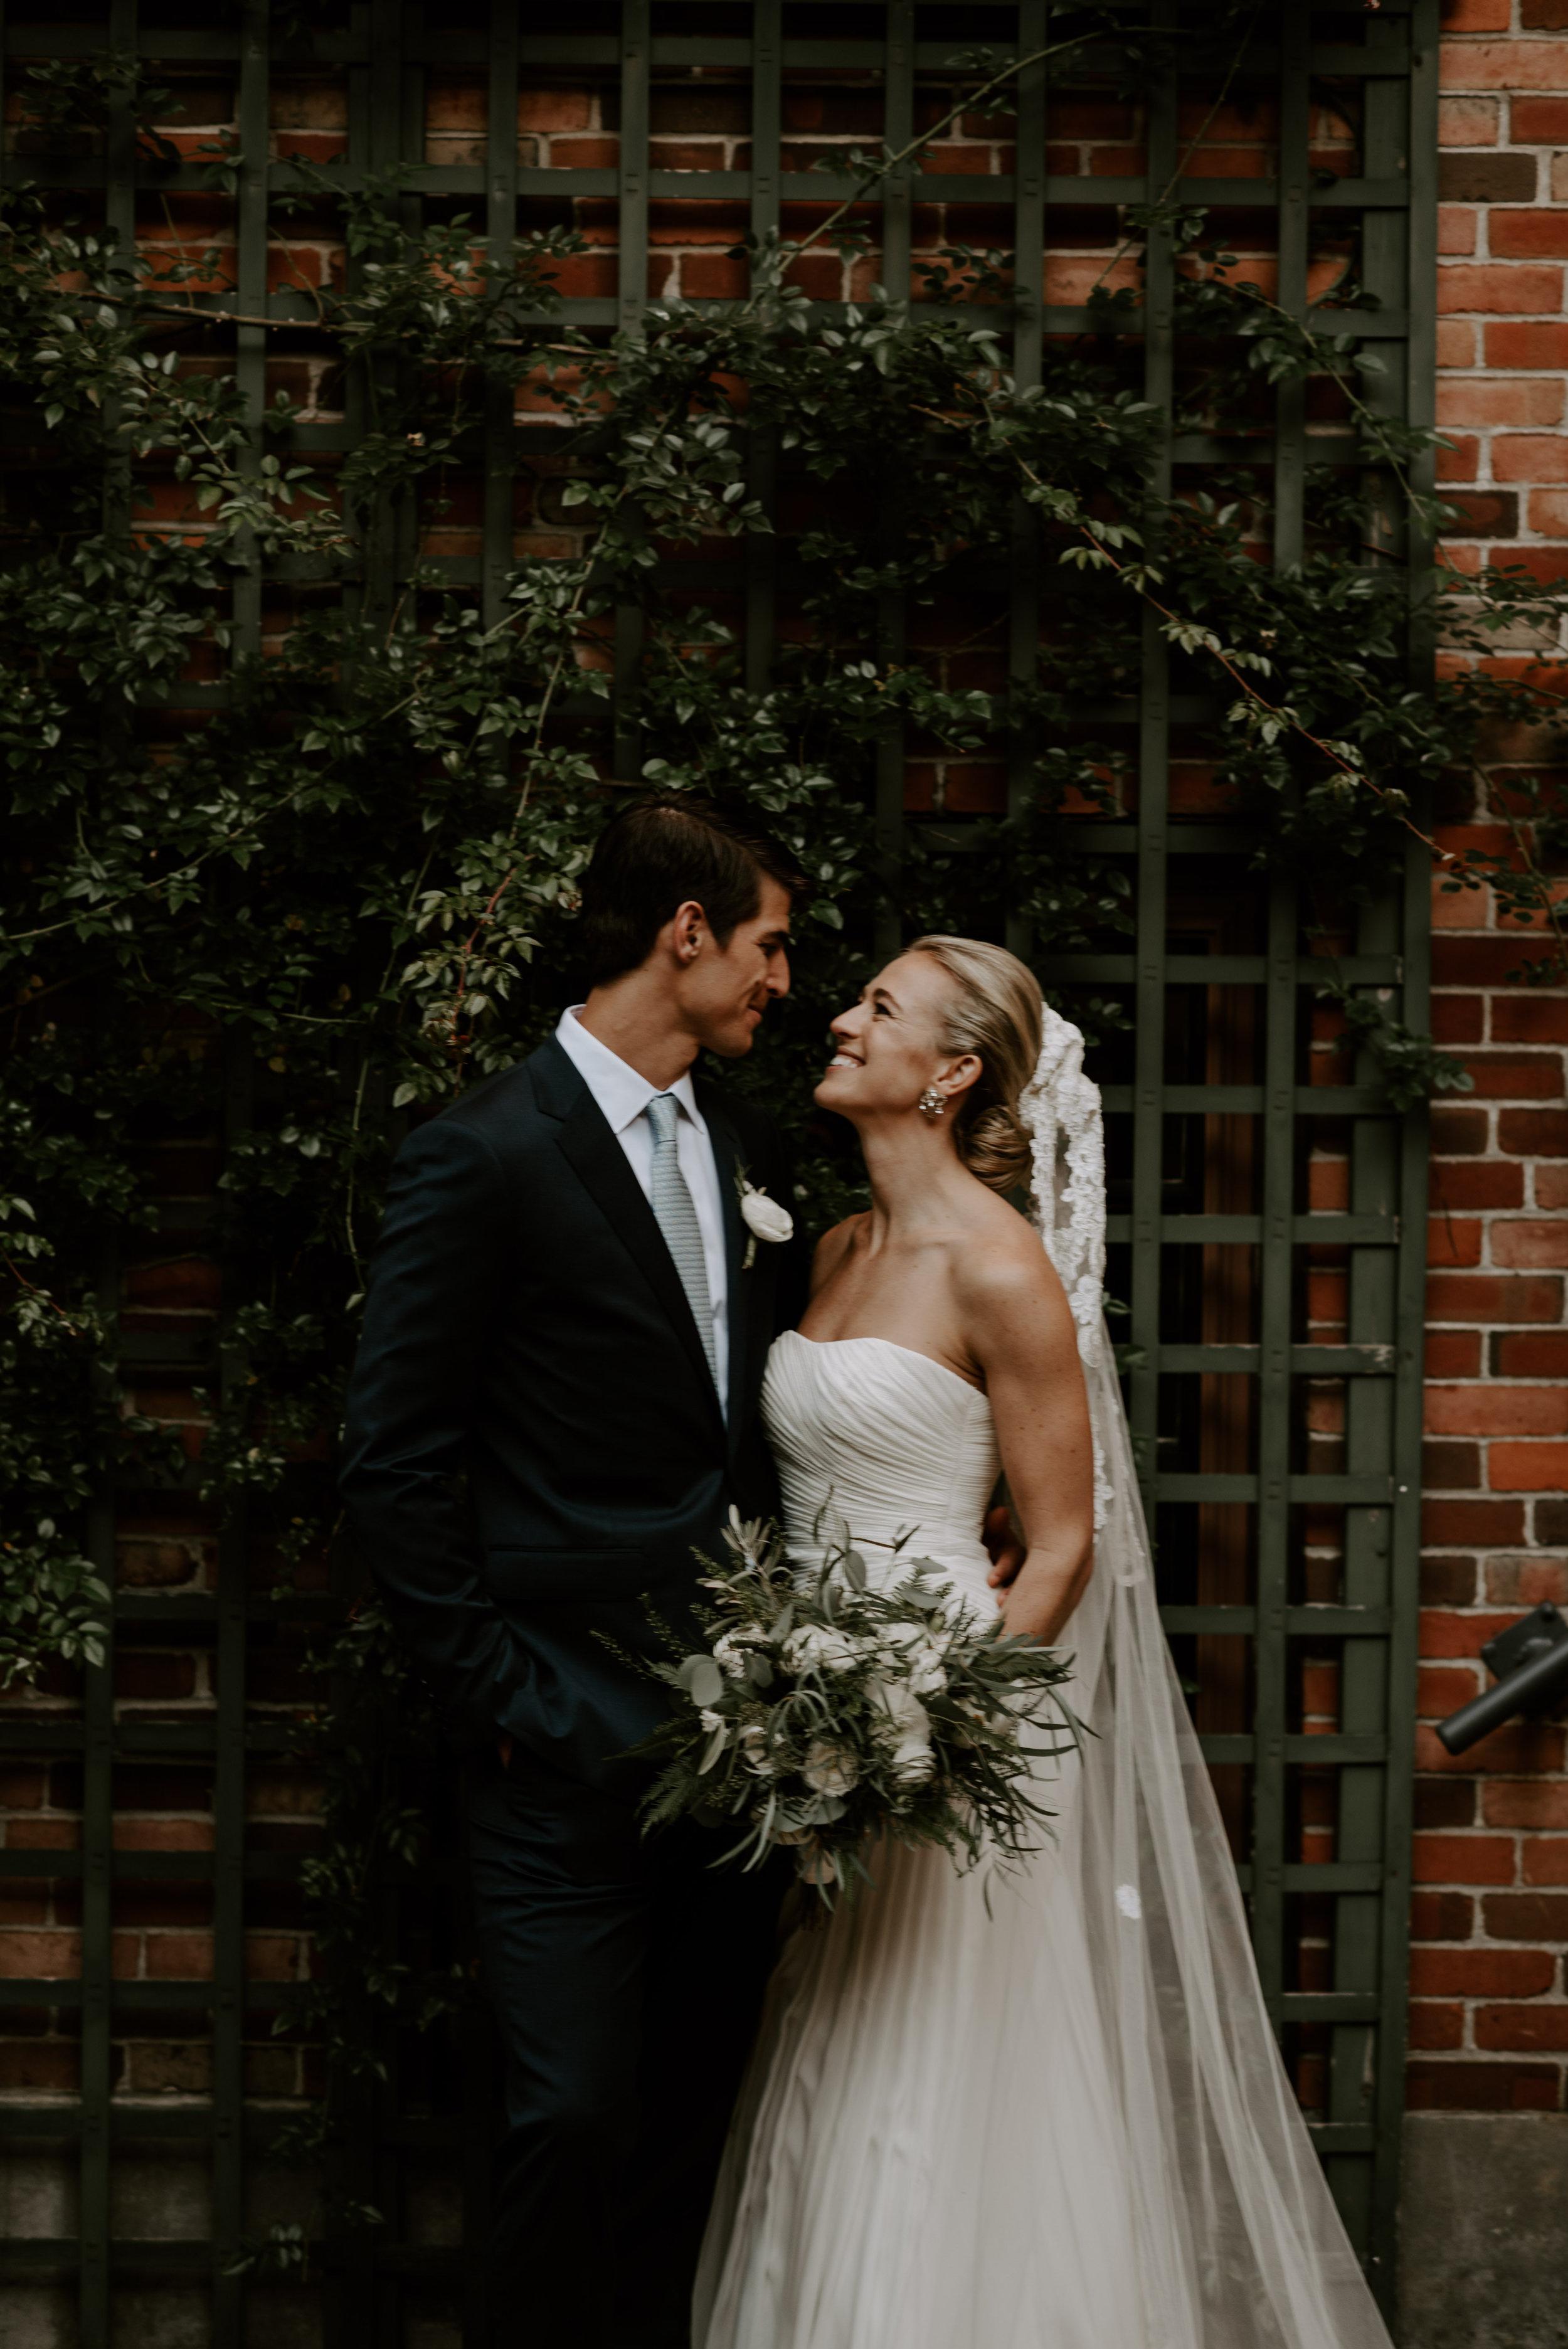 Moody Intimate Library Wedding   Boston Wedding Photographer   Madeline Rose Photography Co.